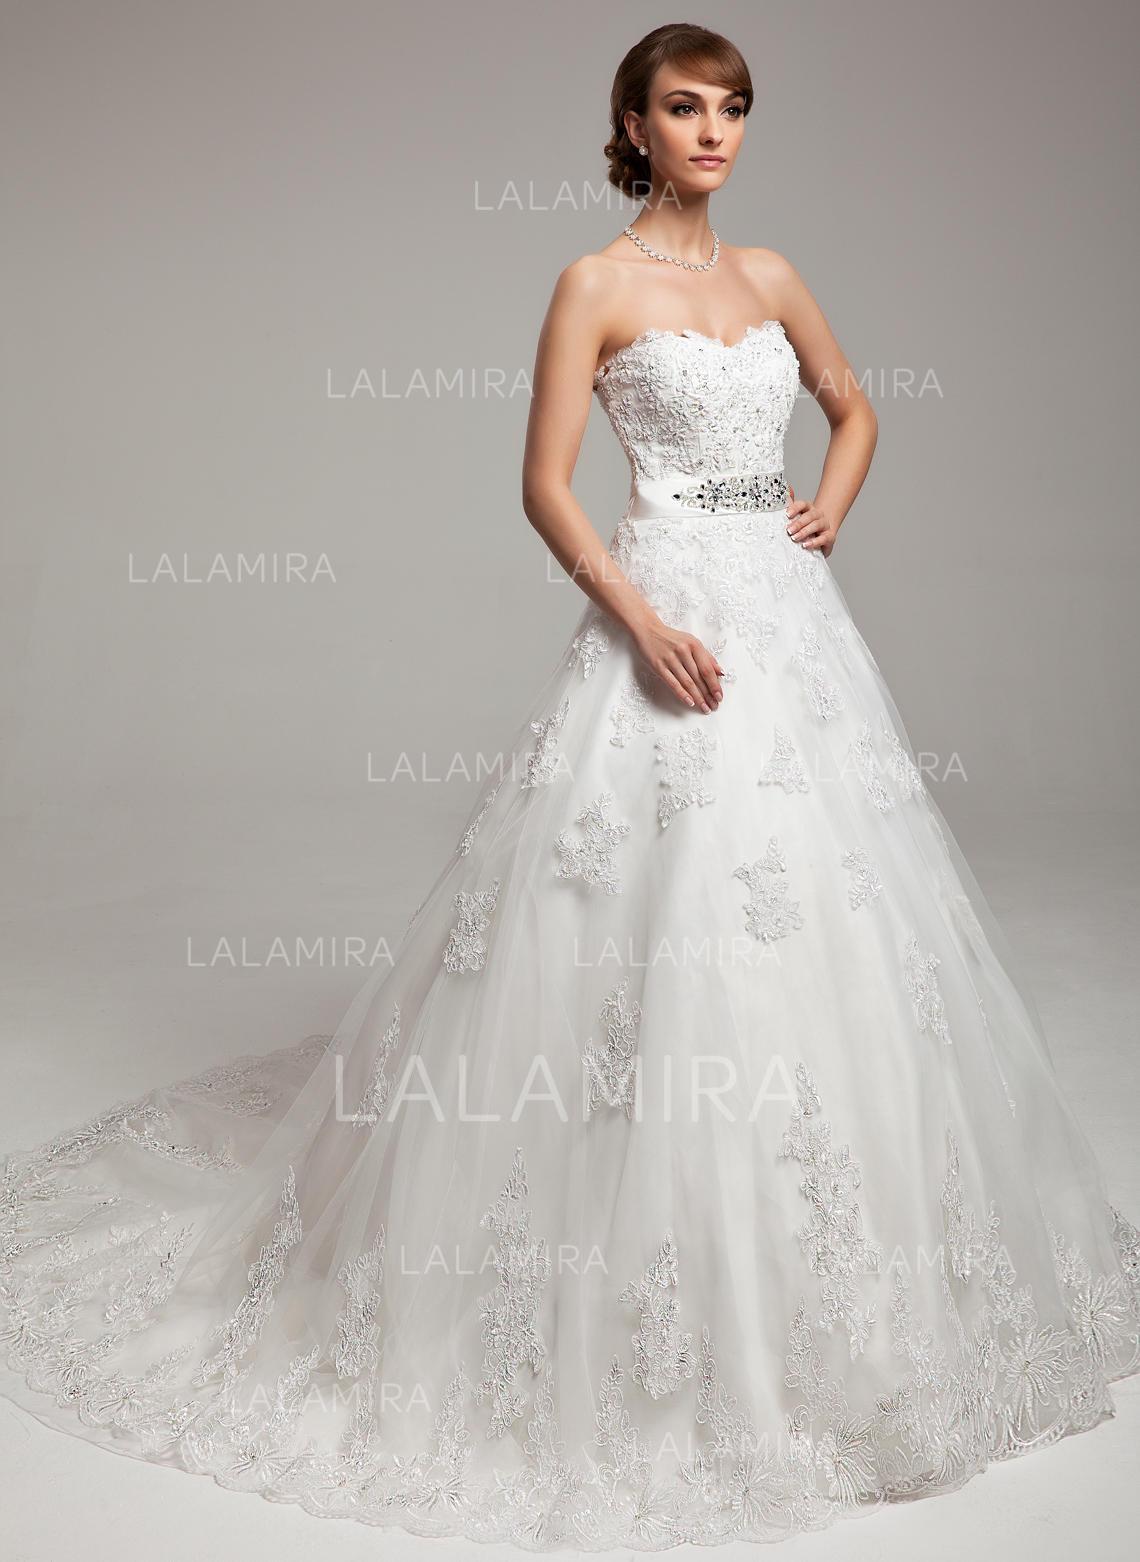 Sweetheart Ball-Gown Wedding Dresses Organza Beading Appliques Bow(s)  Sleeveless Chapel Train. Loading zoom e690751d0